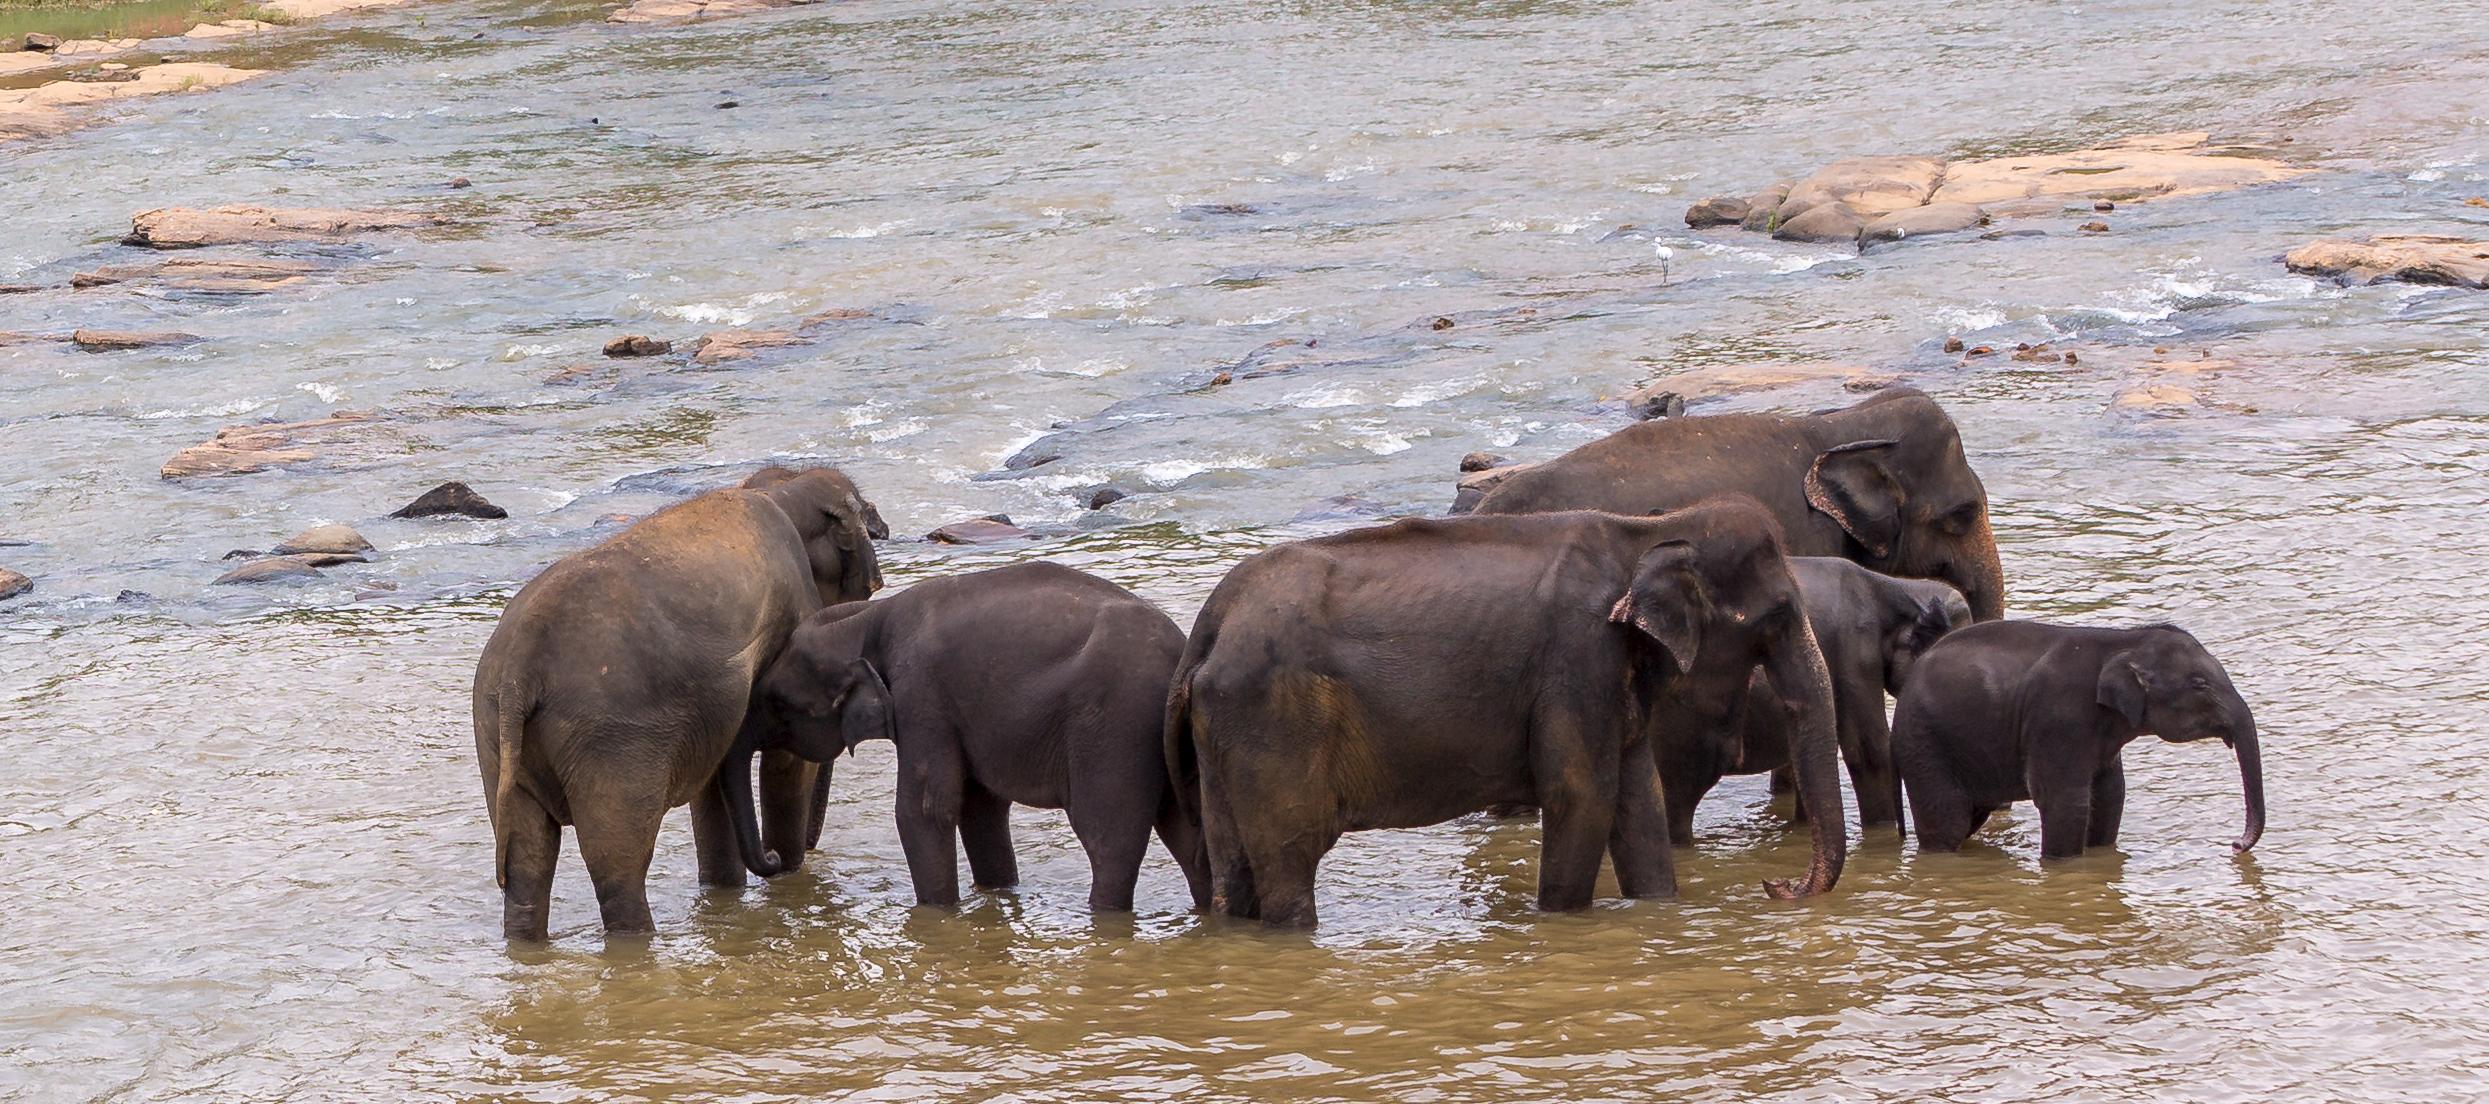 Sri-Lanka-orphelinat-elephants-2017-Marie-Colette-Becker_05